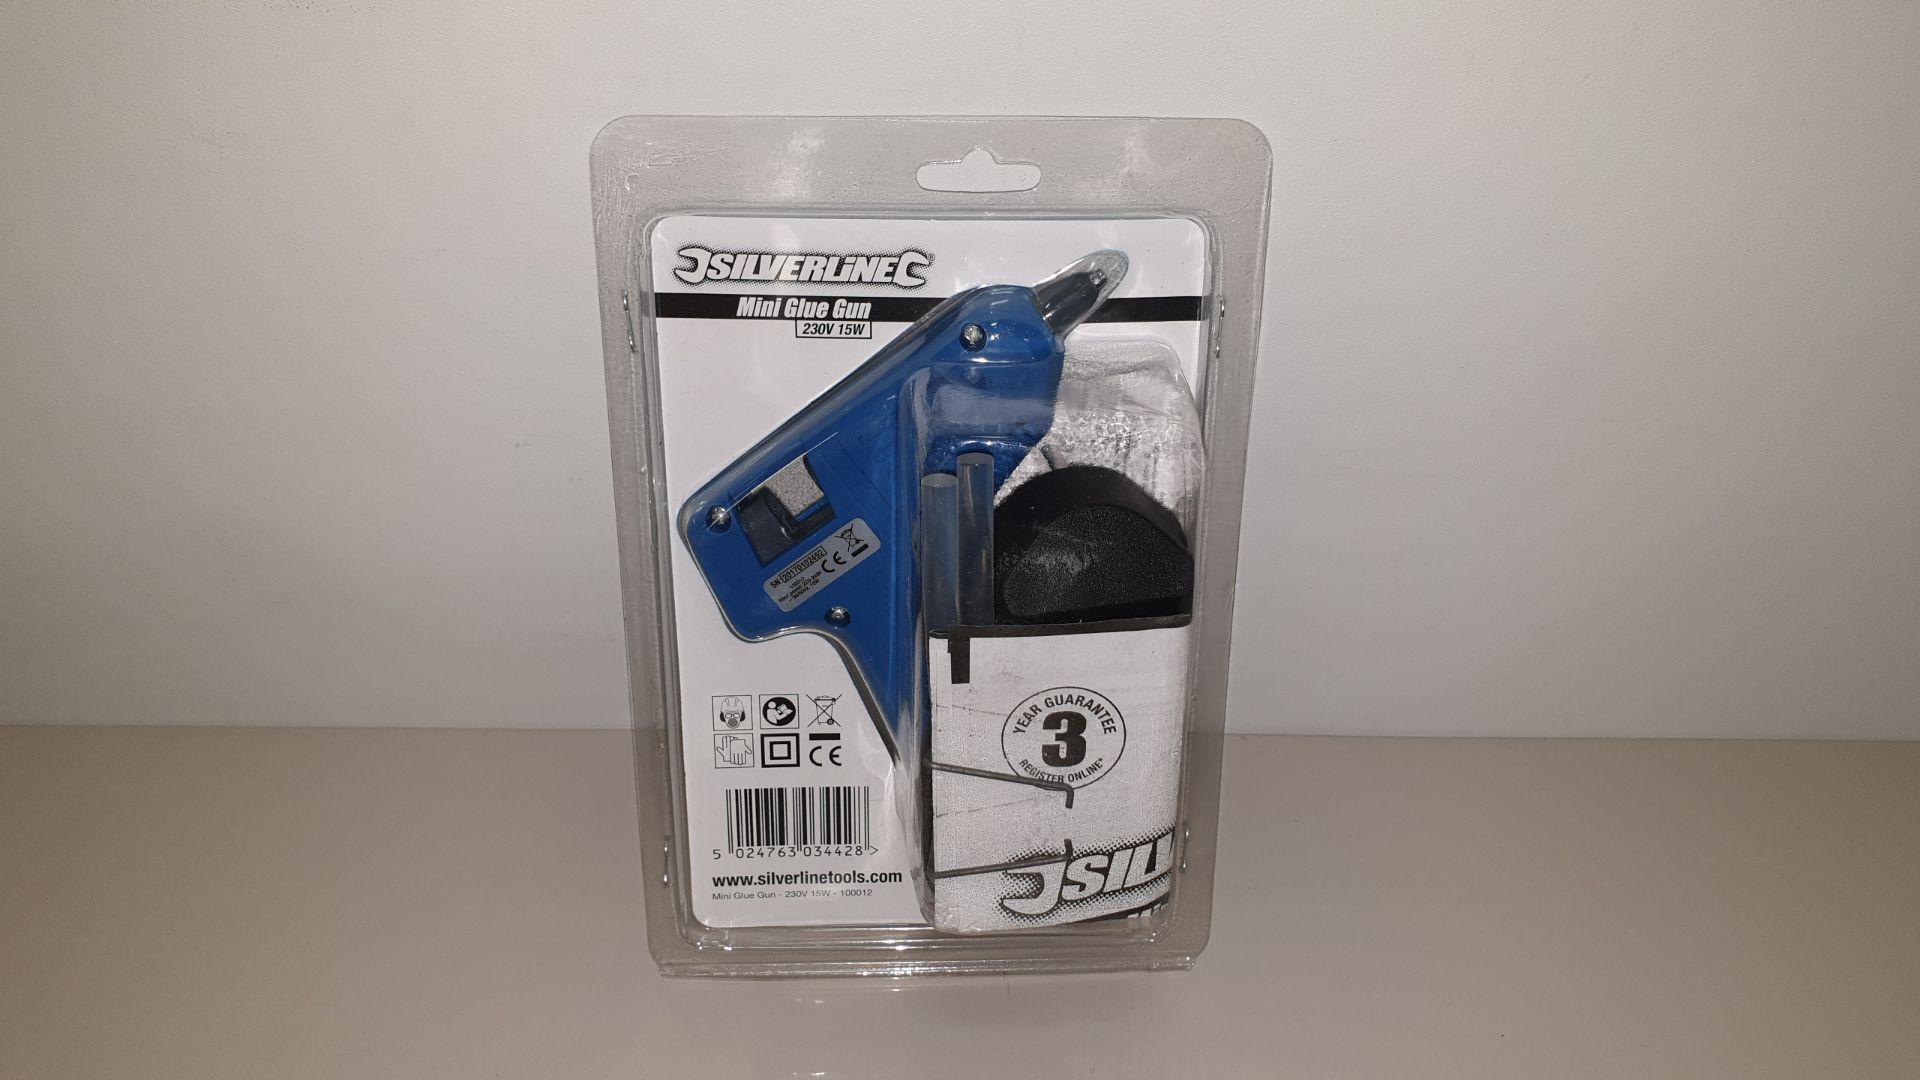 Lot 296 - 36 X SILVERLINE MINI HOT MELT GLUE GUNS 230V 7-10W PLUS 2 GLUE STICKS (PROD CODE 100012) TRADE PRICE